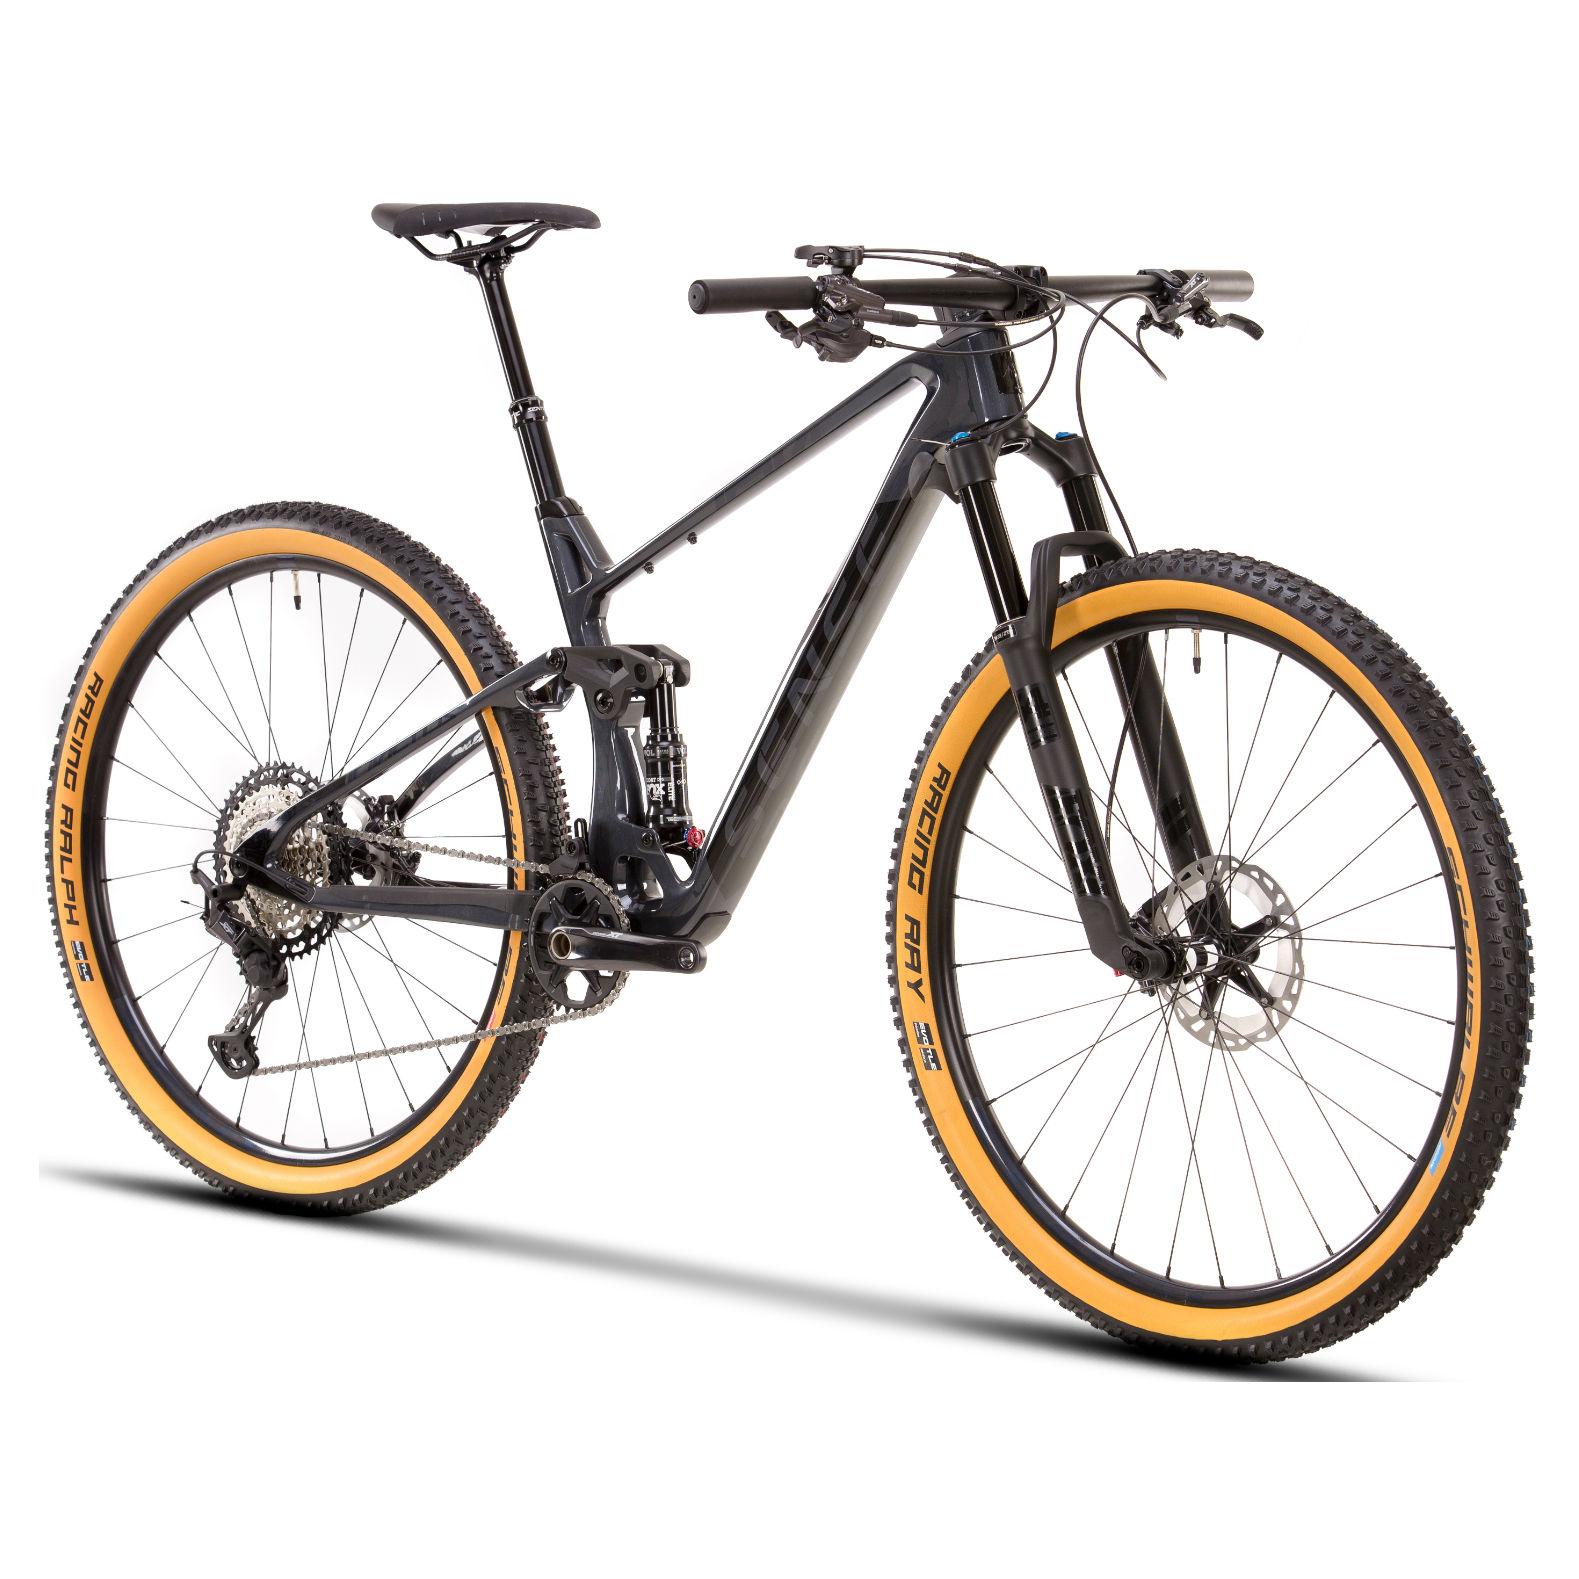 Bicicleta MTB Sense Invictus Evo 12v 2021/2022